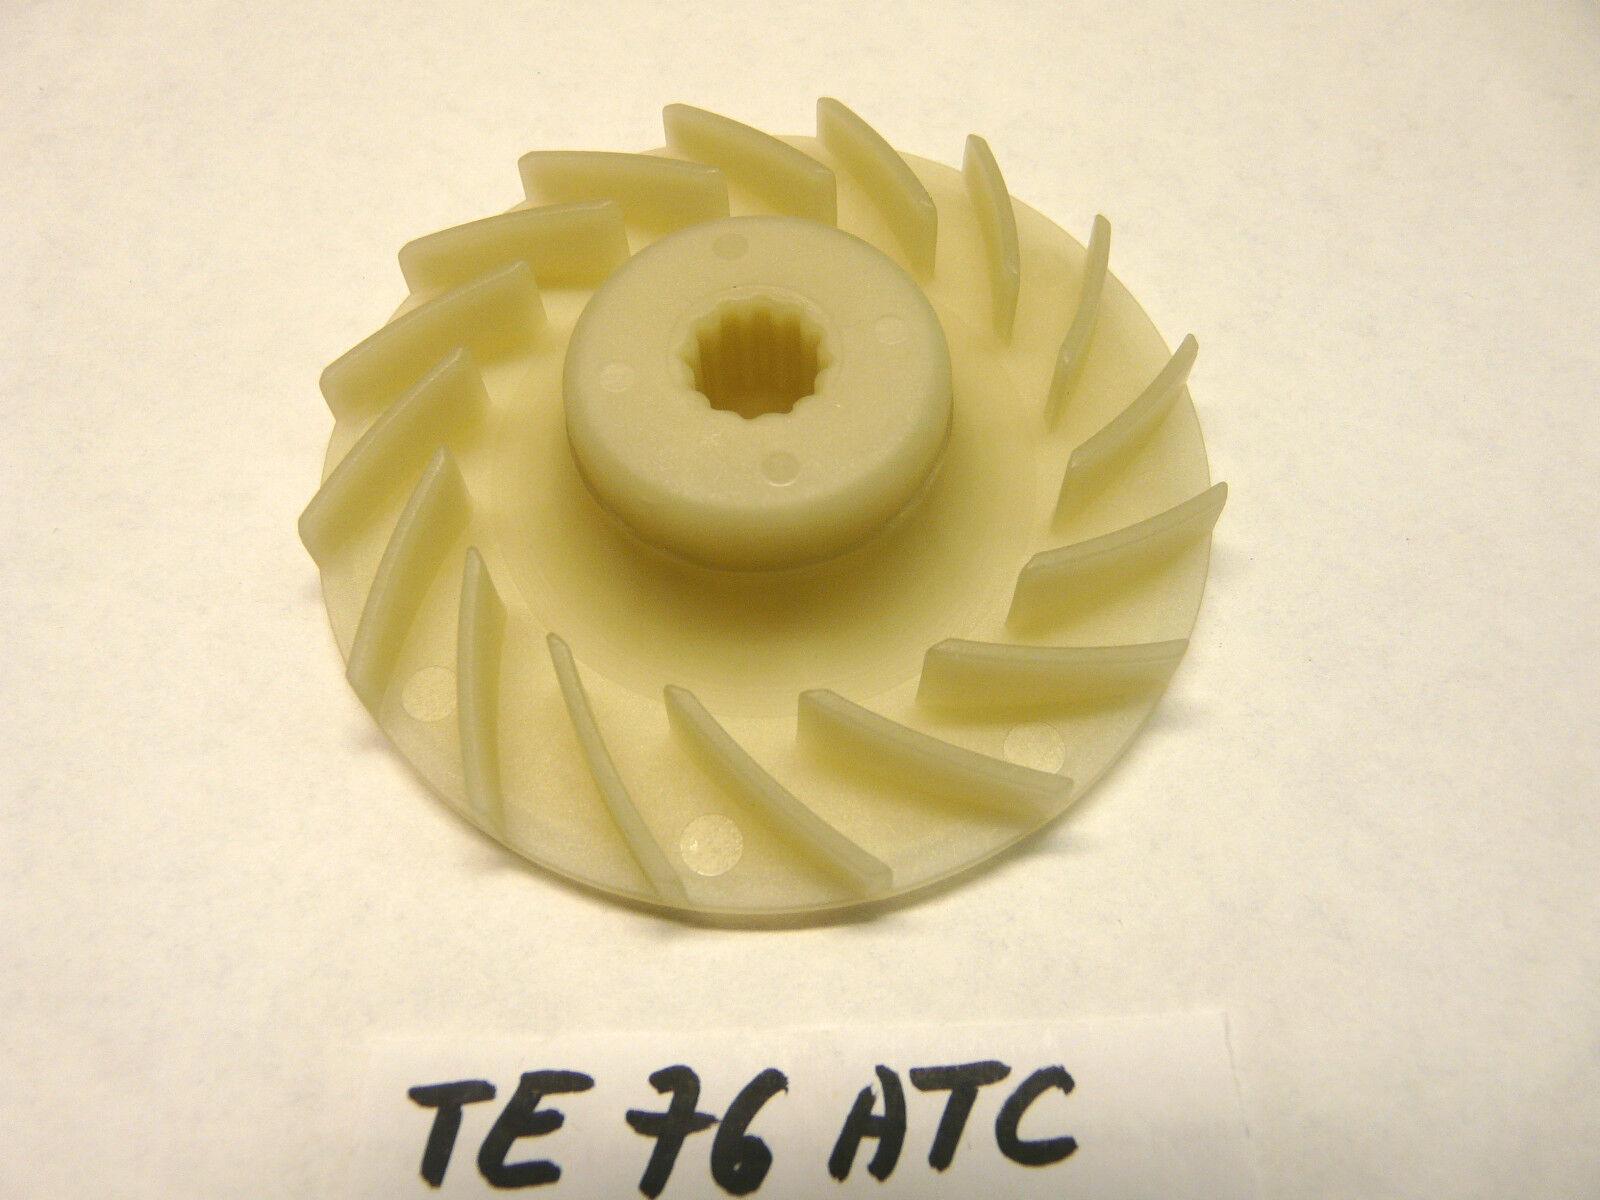 Hilti TE 76 ATC Lüfter       (330326.14)